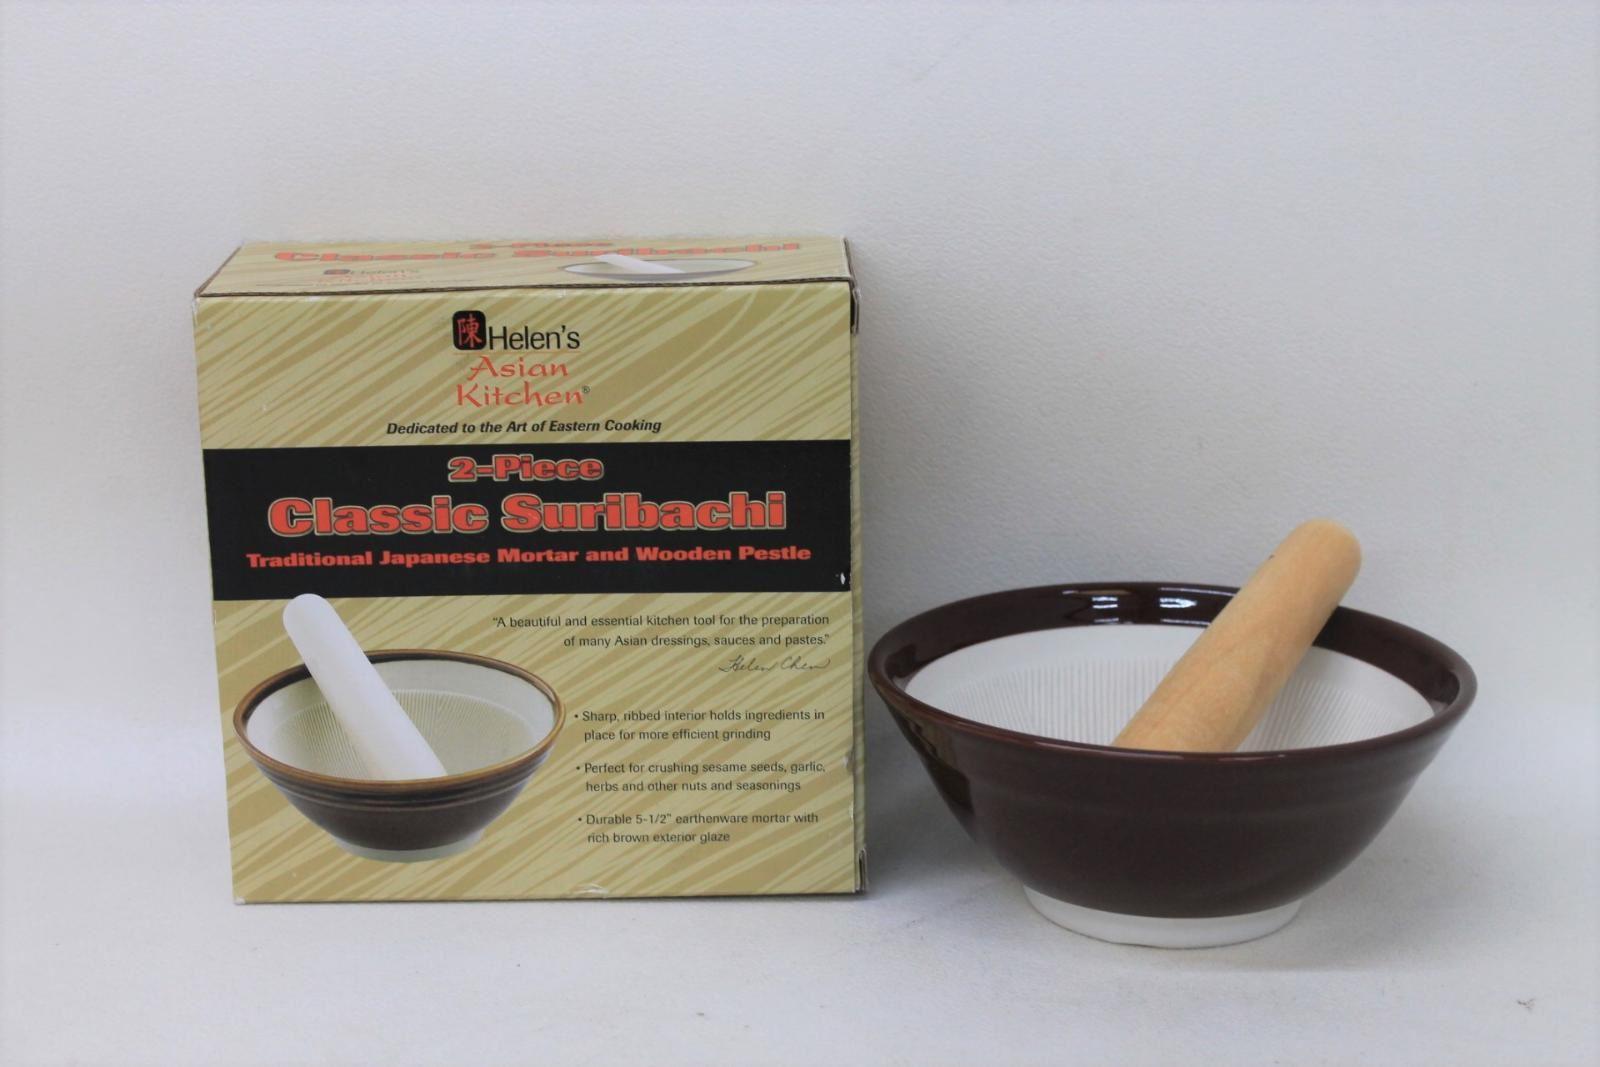 Helen S Asian Kitchen Japanese Traditional Classic Suribachi Mortar Pestle New Ebay